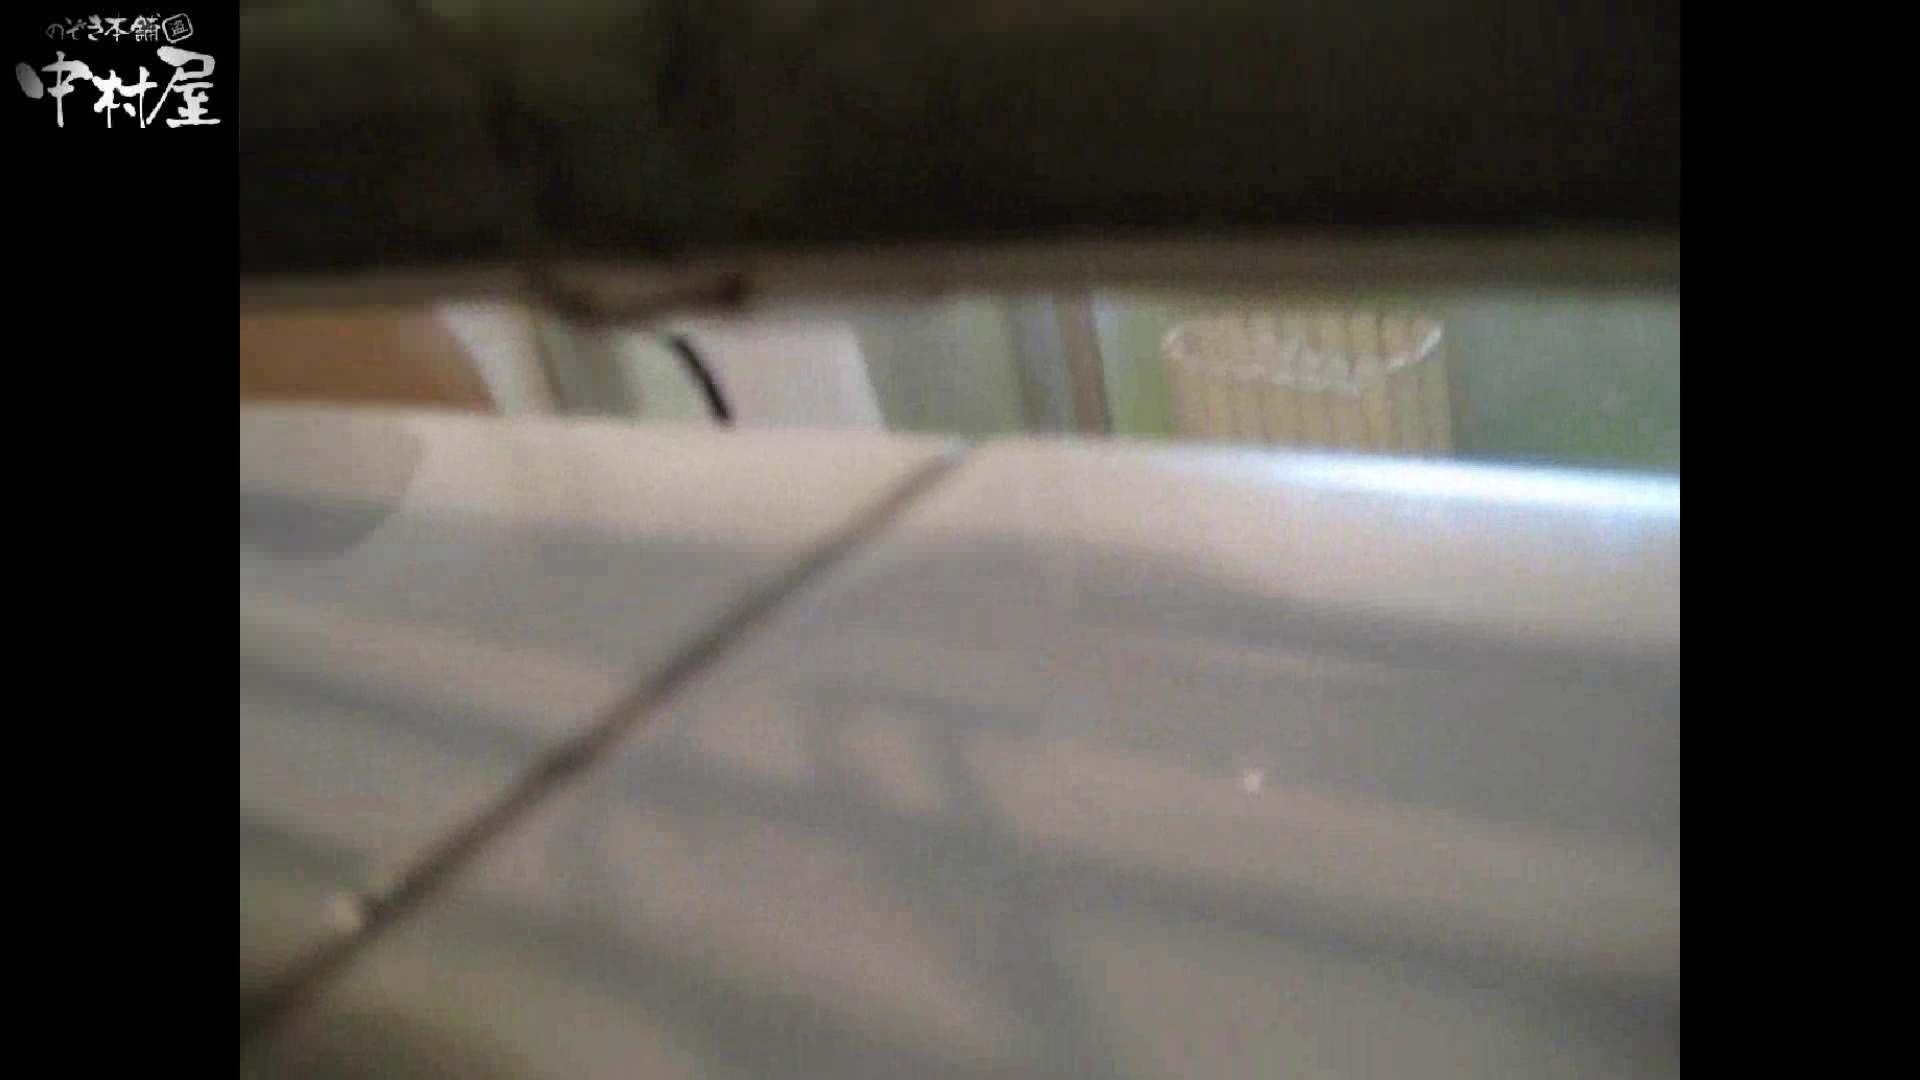 民家風呂専門盗撮師の超危険映像 vol.014後編 エロい美少女 セックス無修正動画無料 113PIX 29